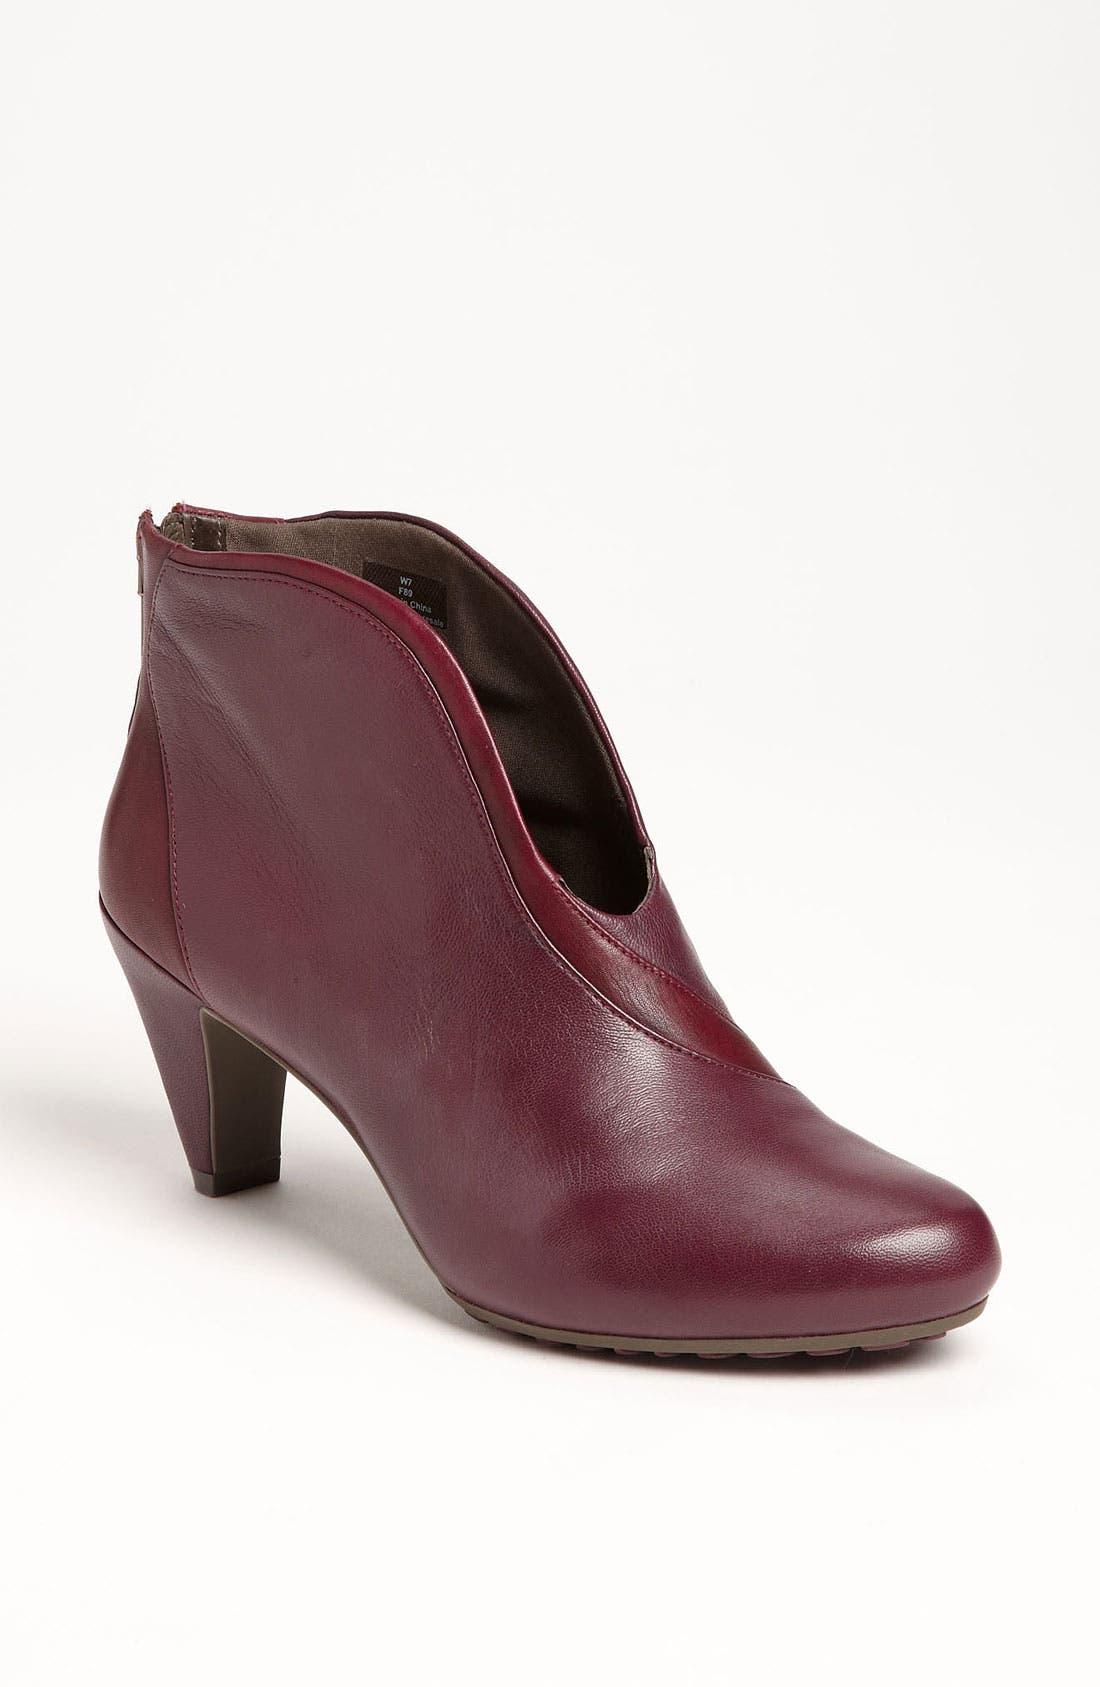 Main Image - Tsubo 'Myla' Boot